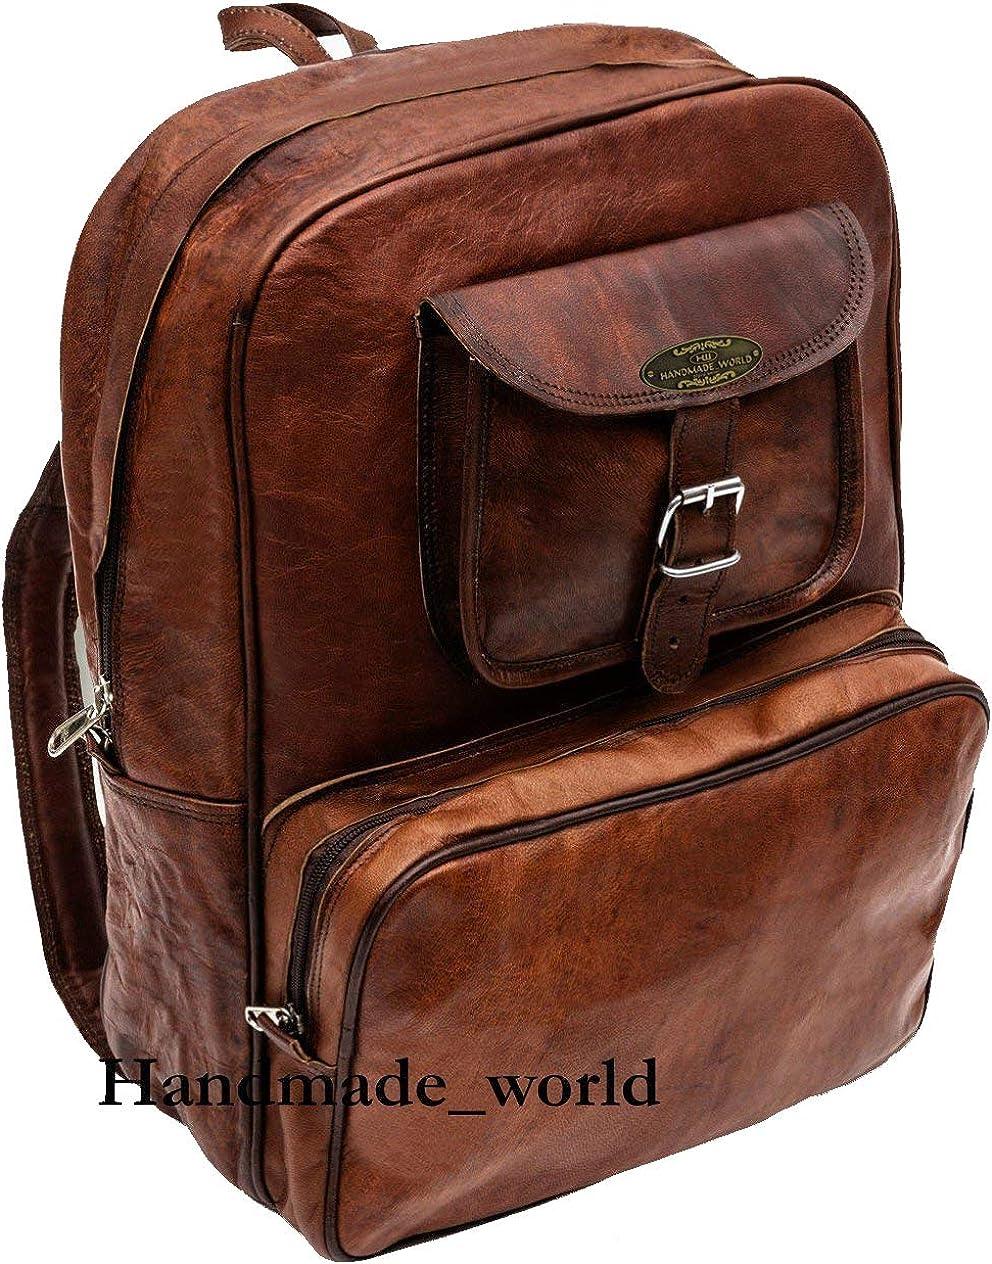 Handmade World Vintage Laptop Leather Backpack Lightweight School College Bag Rucksack Fits 15-inch Notebook Computer